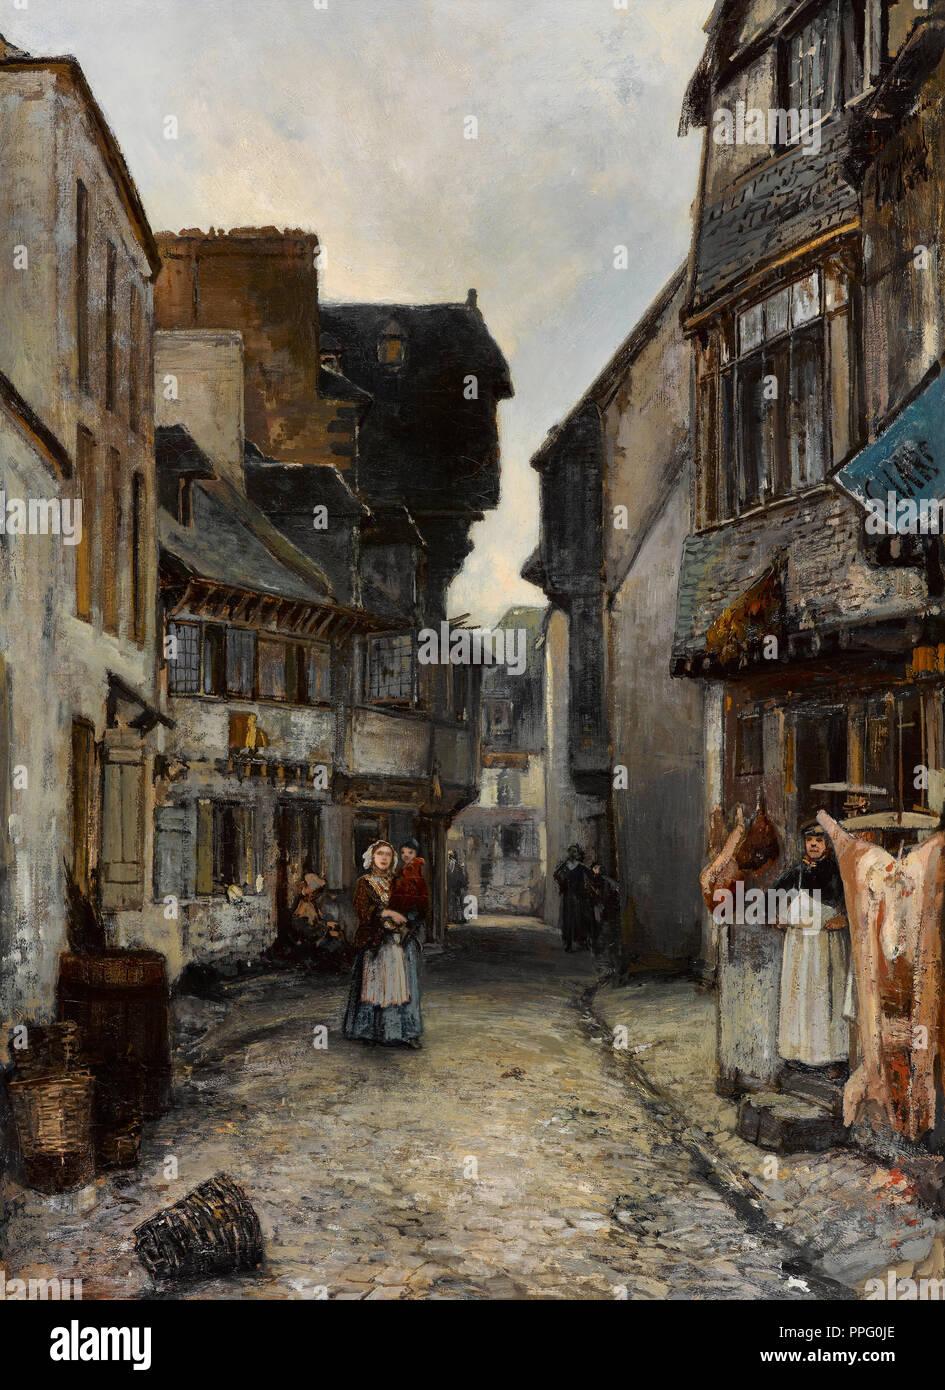 Johan Jongkind - une rue de Landerneau 1851 Huile sur toile. Gemeentemuseum Den Haag, La Haye, Pays-Bas. Photo Stock